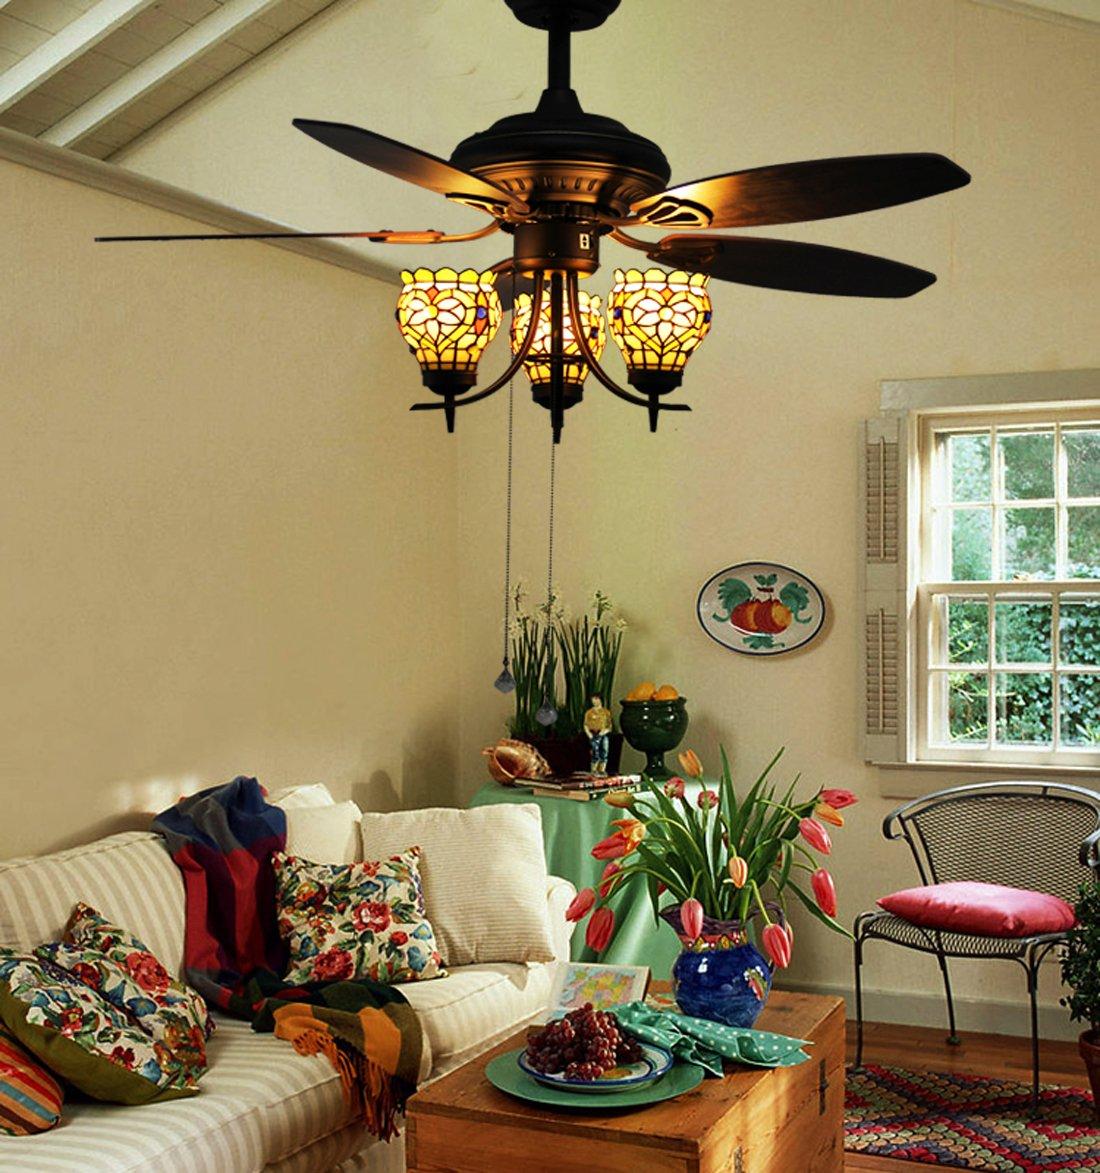 Makenier Vintage Tiffany Style Stained Glass 3-light Flowers Uplight 5-blade Ceiling Fan Light Kit 0